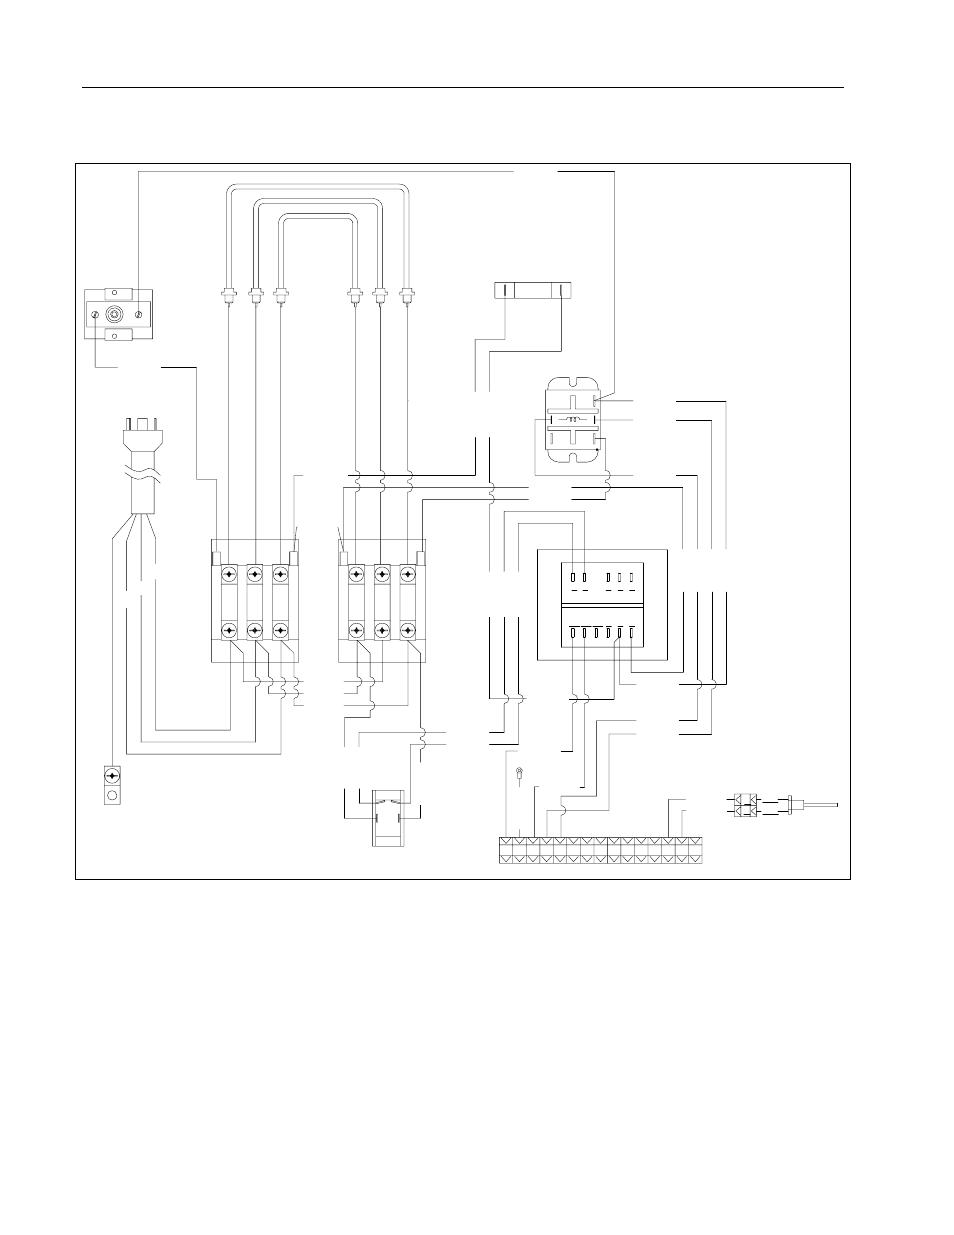 medium resolution of 2 wiring diagram 3 phase frymaster dean sr114e user manual page 9